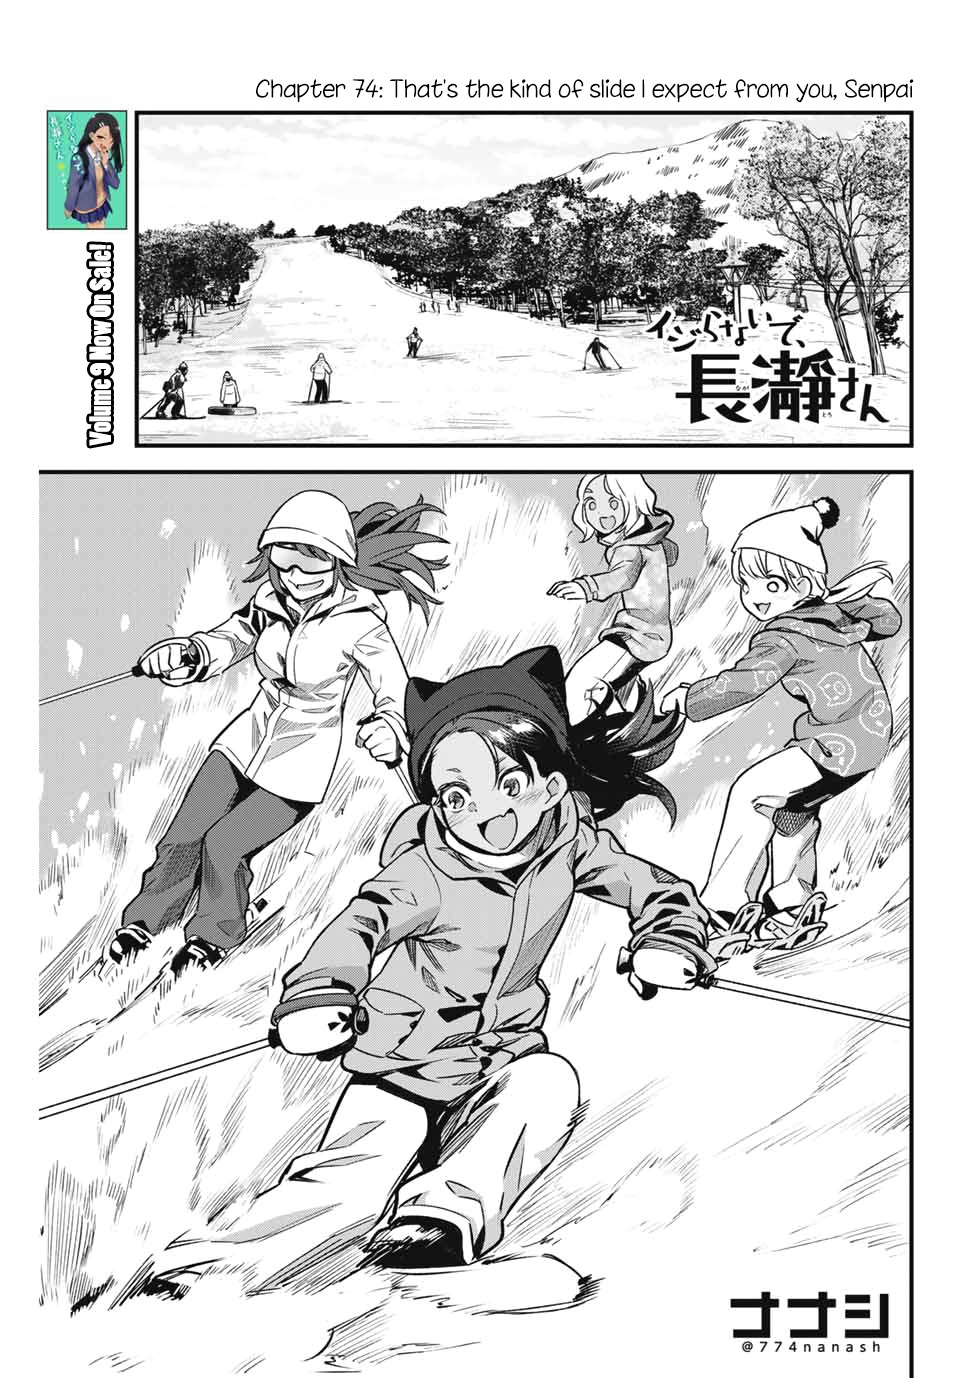 https://manga.mangadogs.com/comics/pic4/45/22445/2643756/debf48b09b591ef018c9d51f90a2a4d3.jpg Page 1